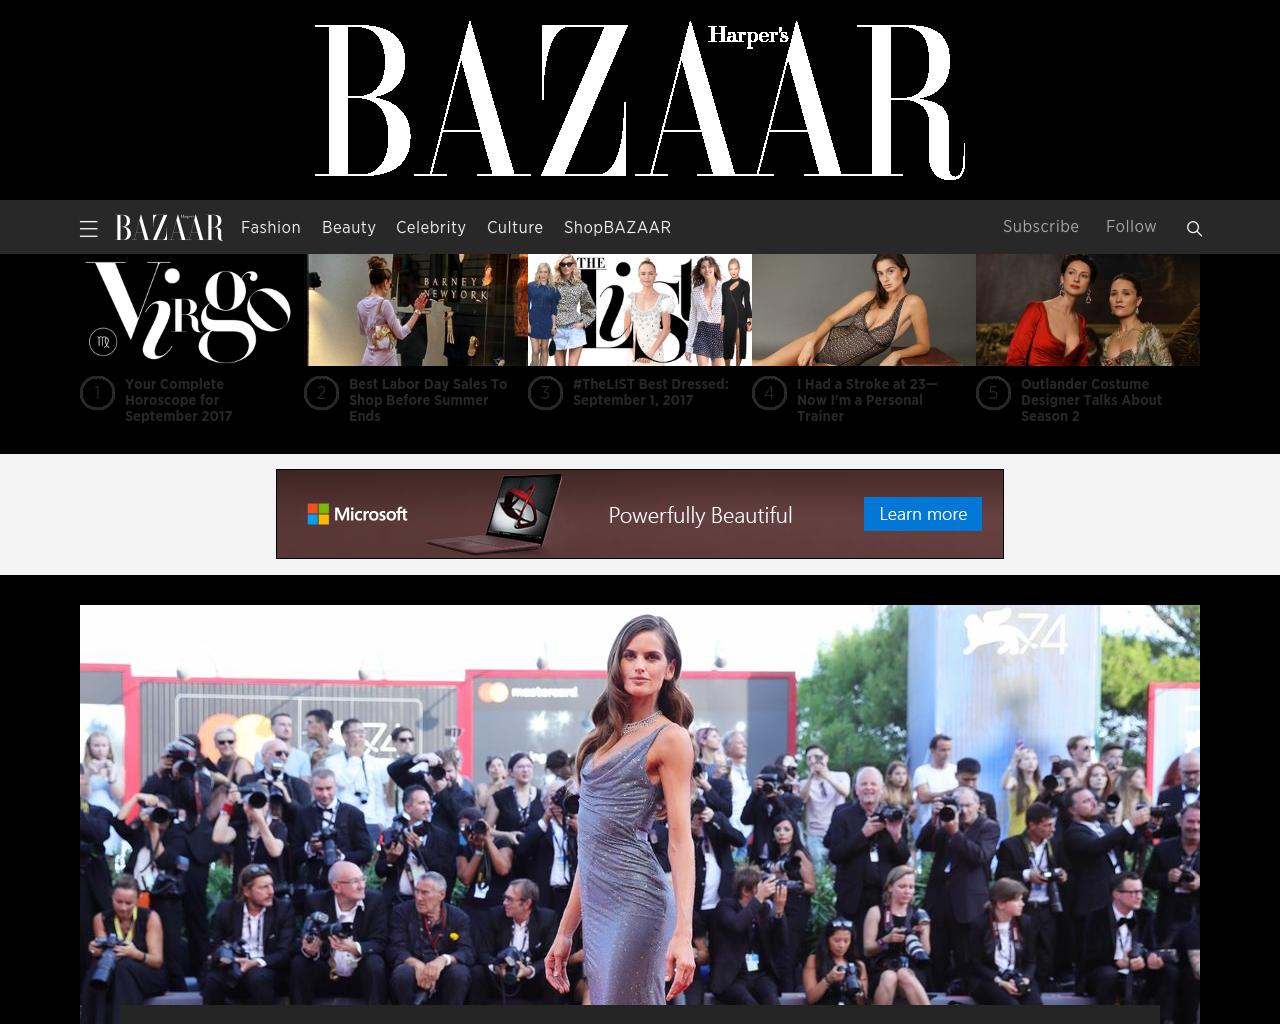 Harper's-BAZAAR-Advertising-Reviews-Pricing